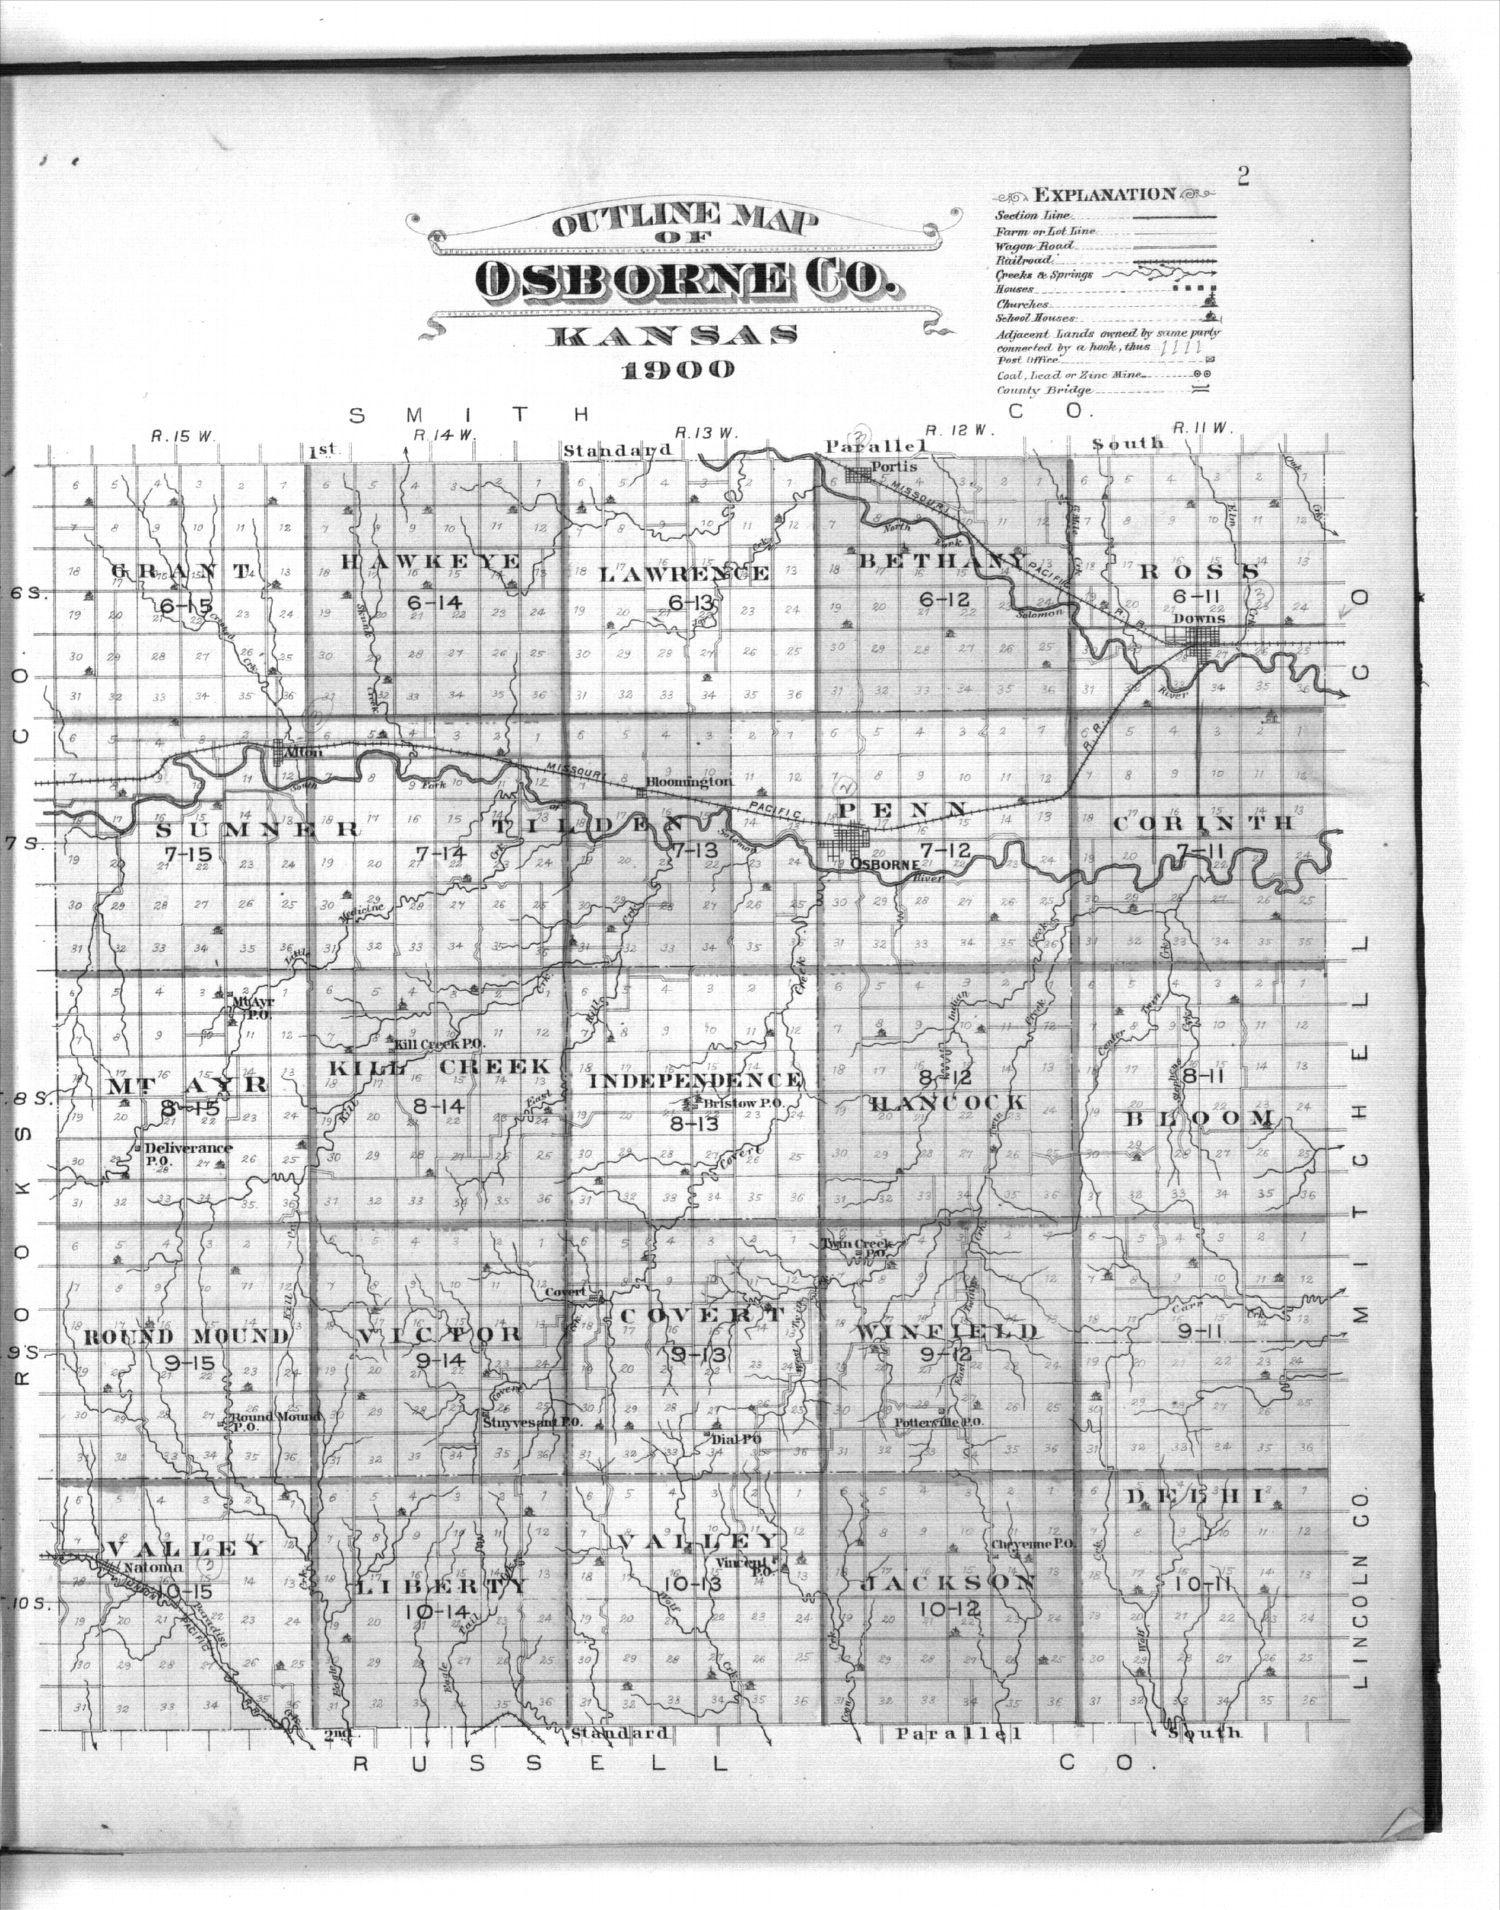 Plat book of Osborne County, Kansas - 2